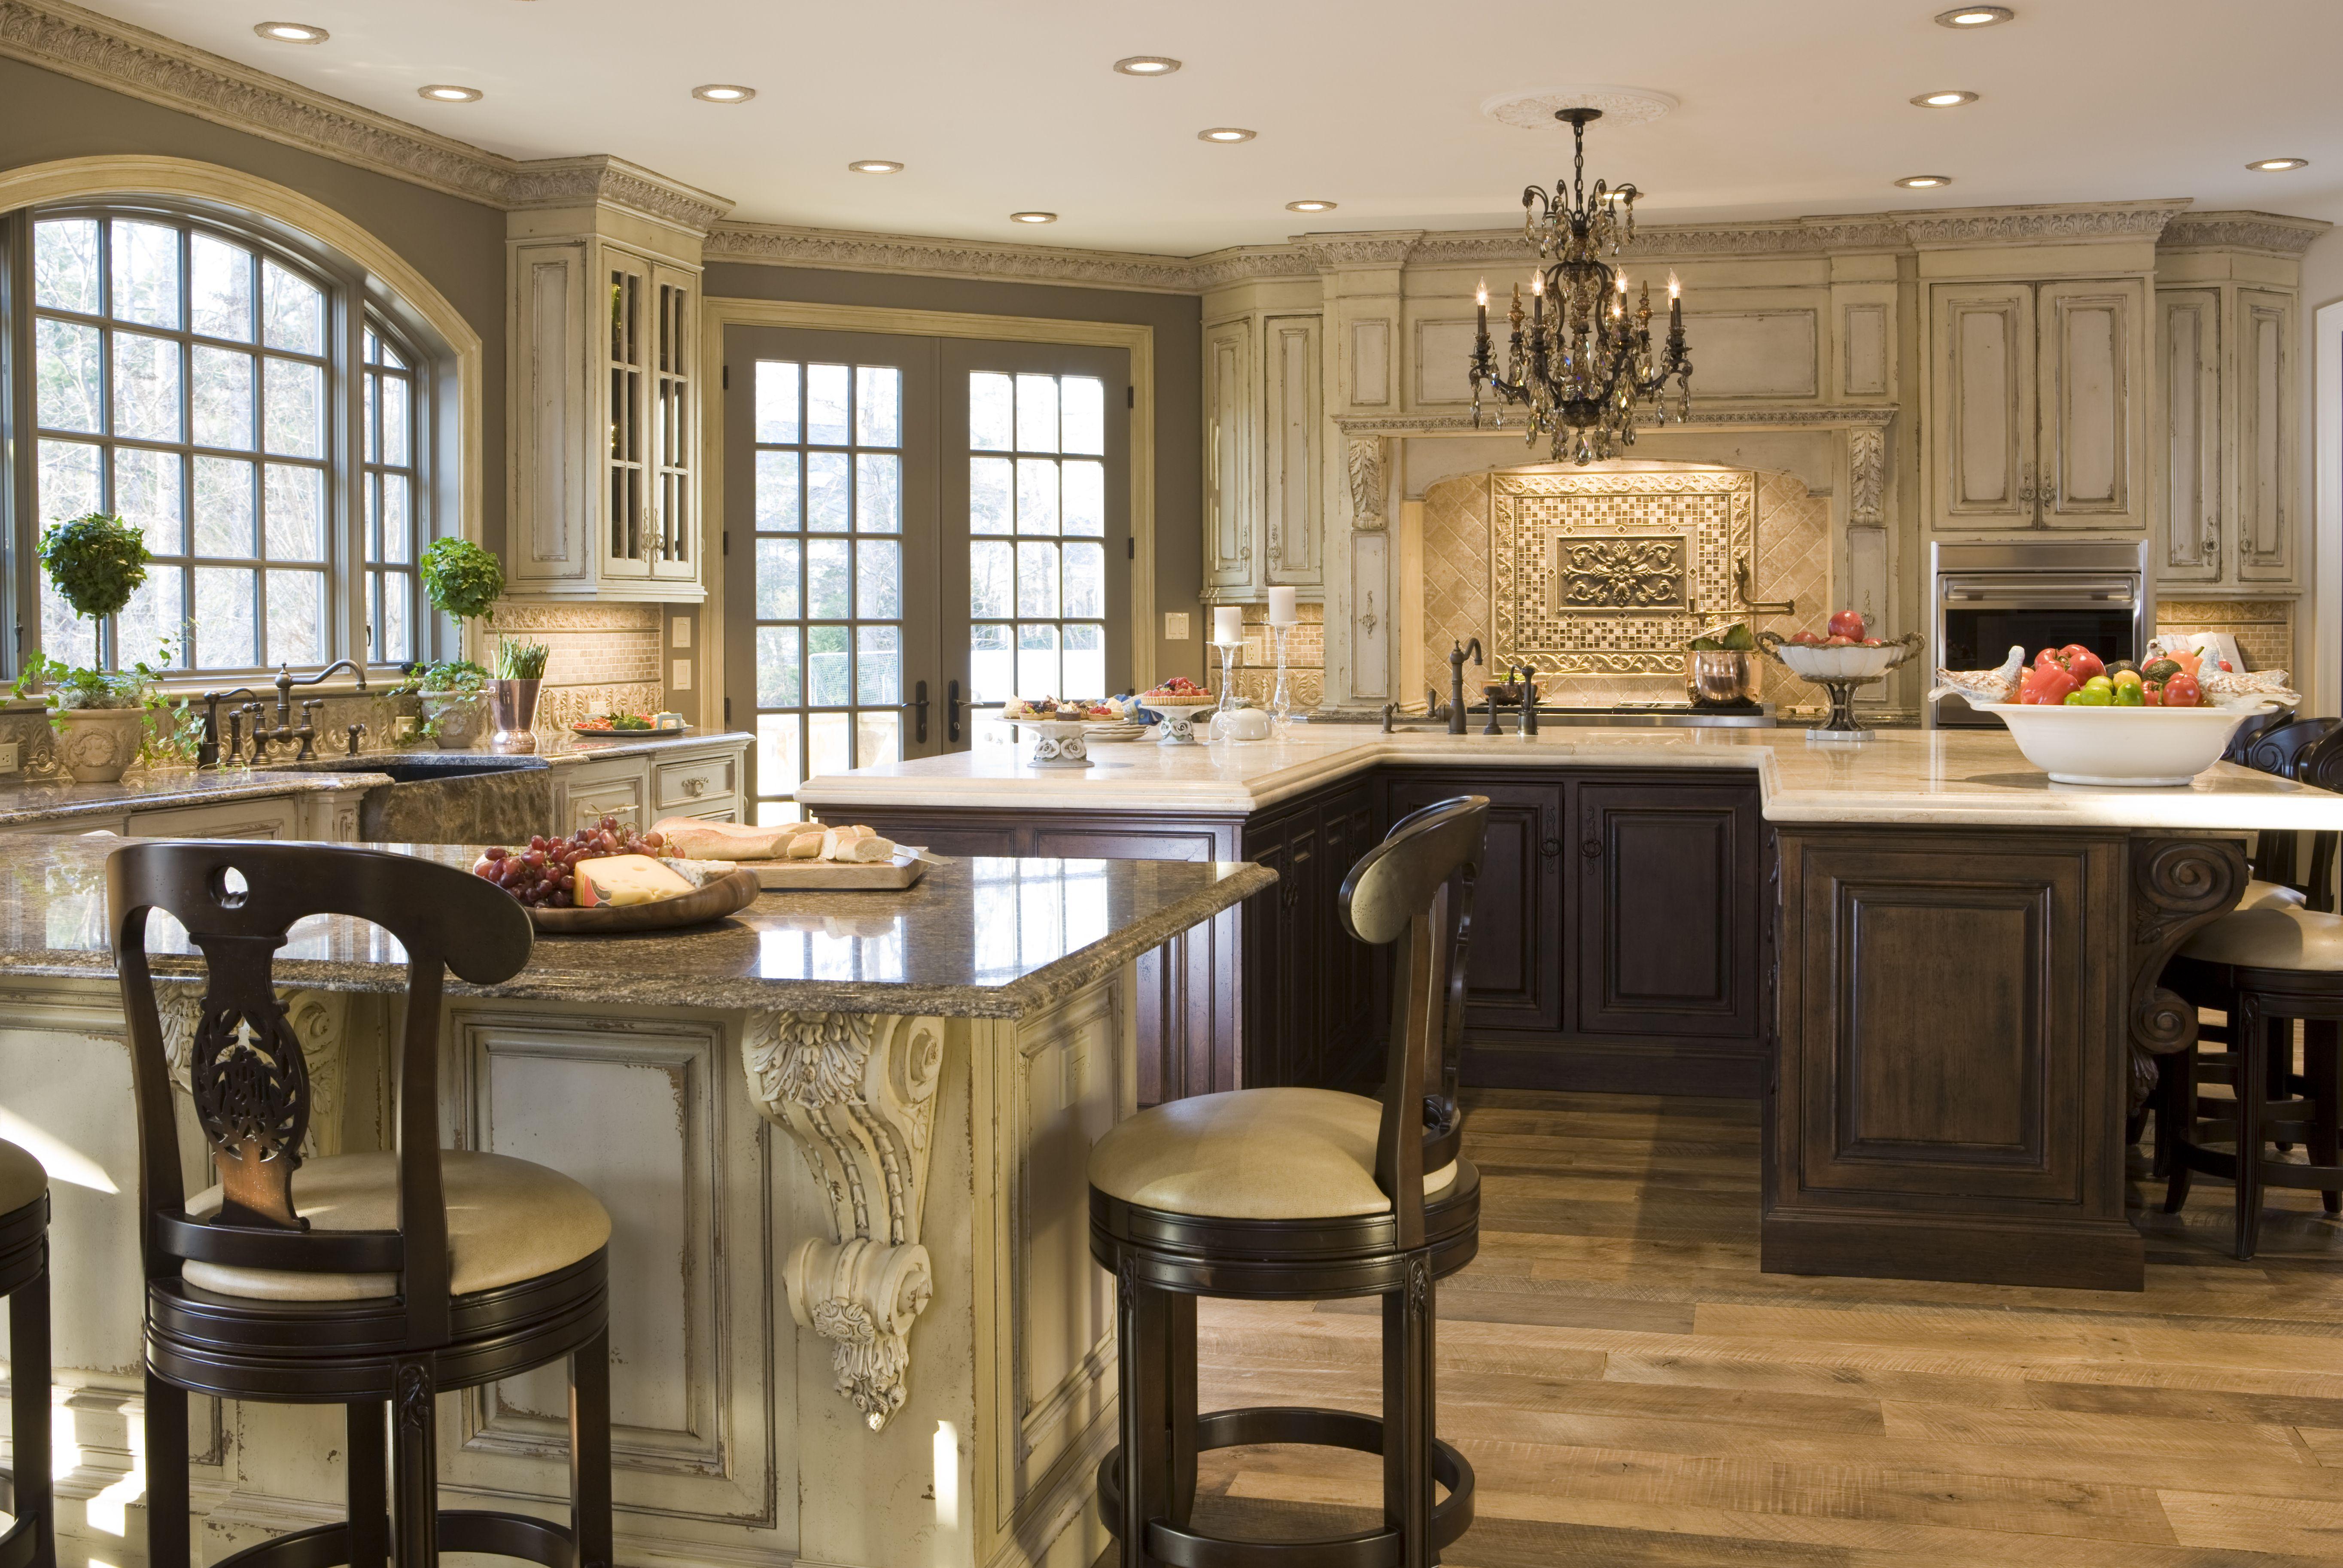 Luxury Kitchens White Luxury Kitchens Zitzatcom With Luxury